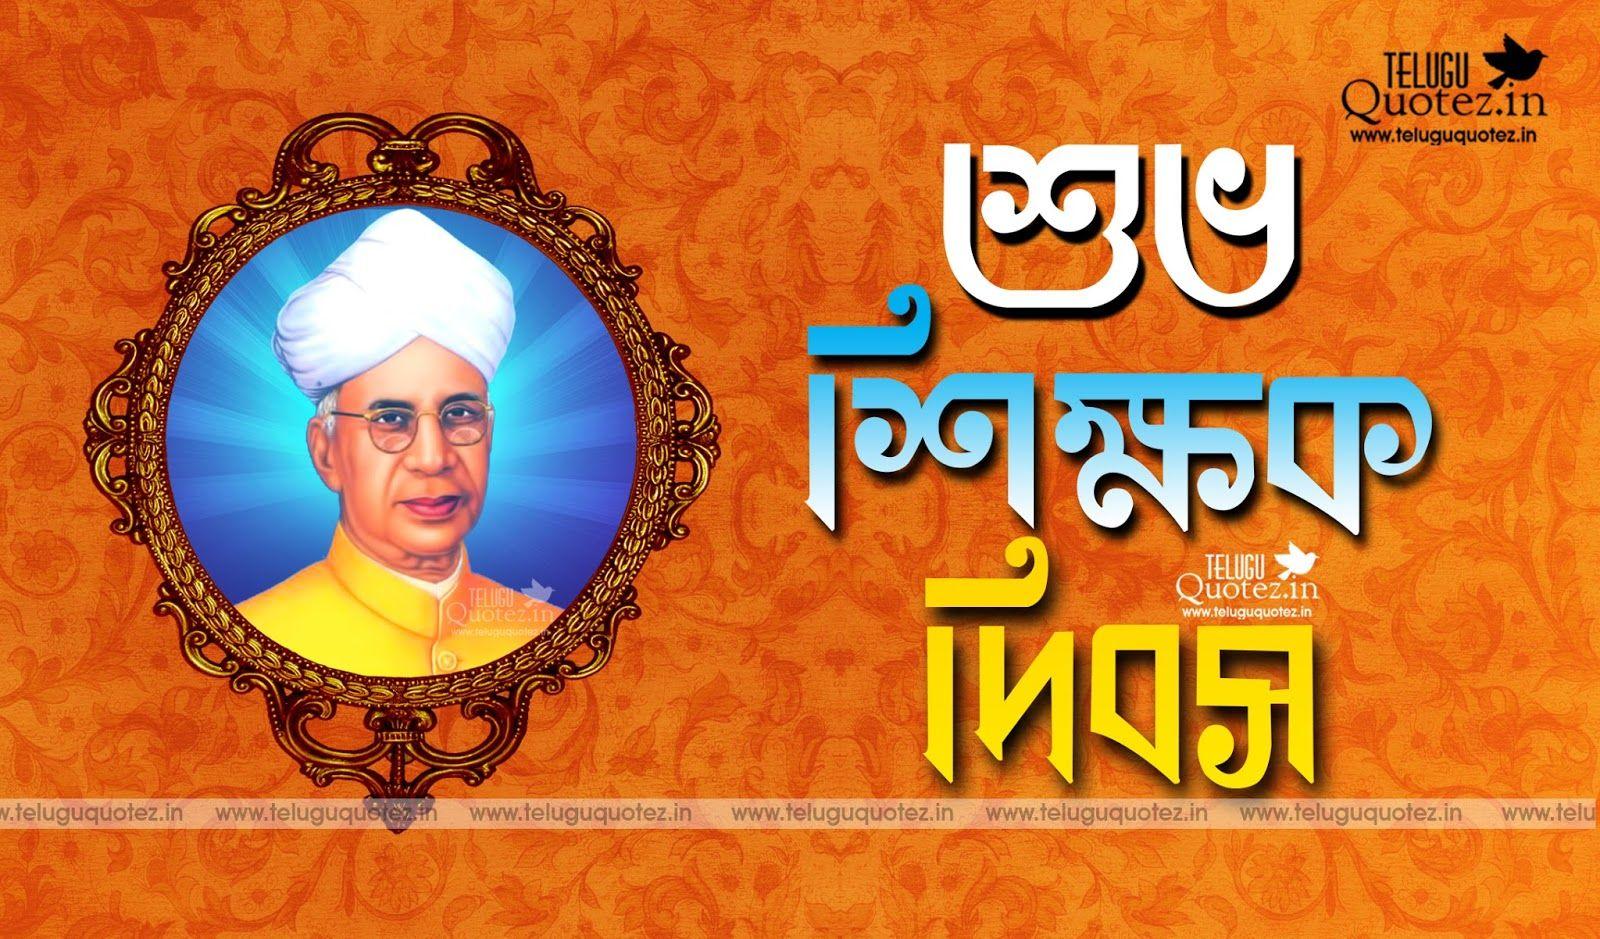 Bangla Teachers Day HD wallpapers in bengali language